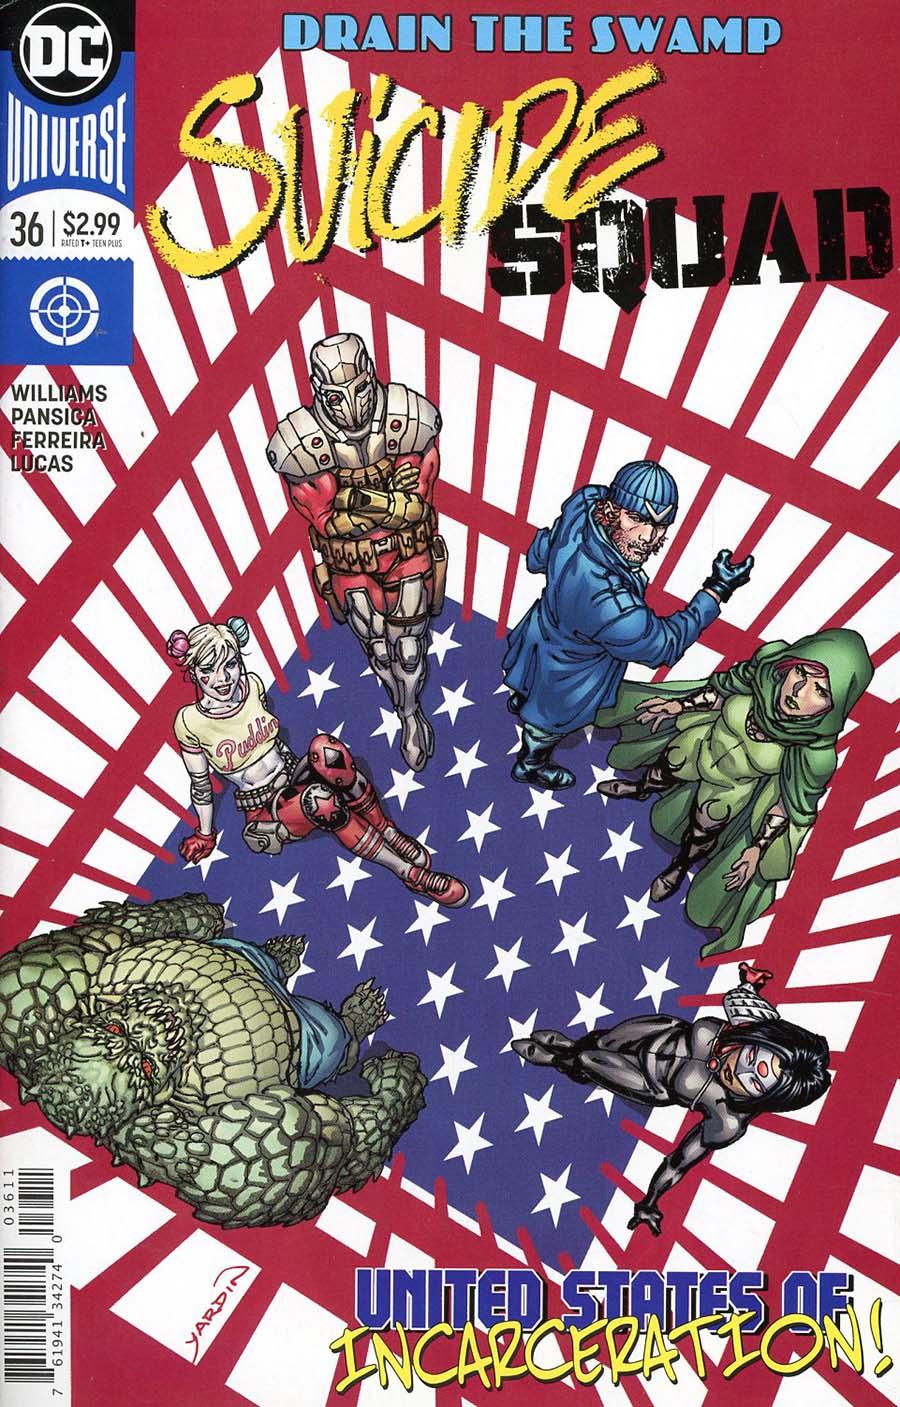 Suicide Squad 36 - Drain the Swamp 2